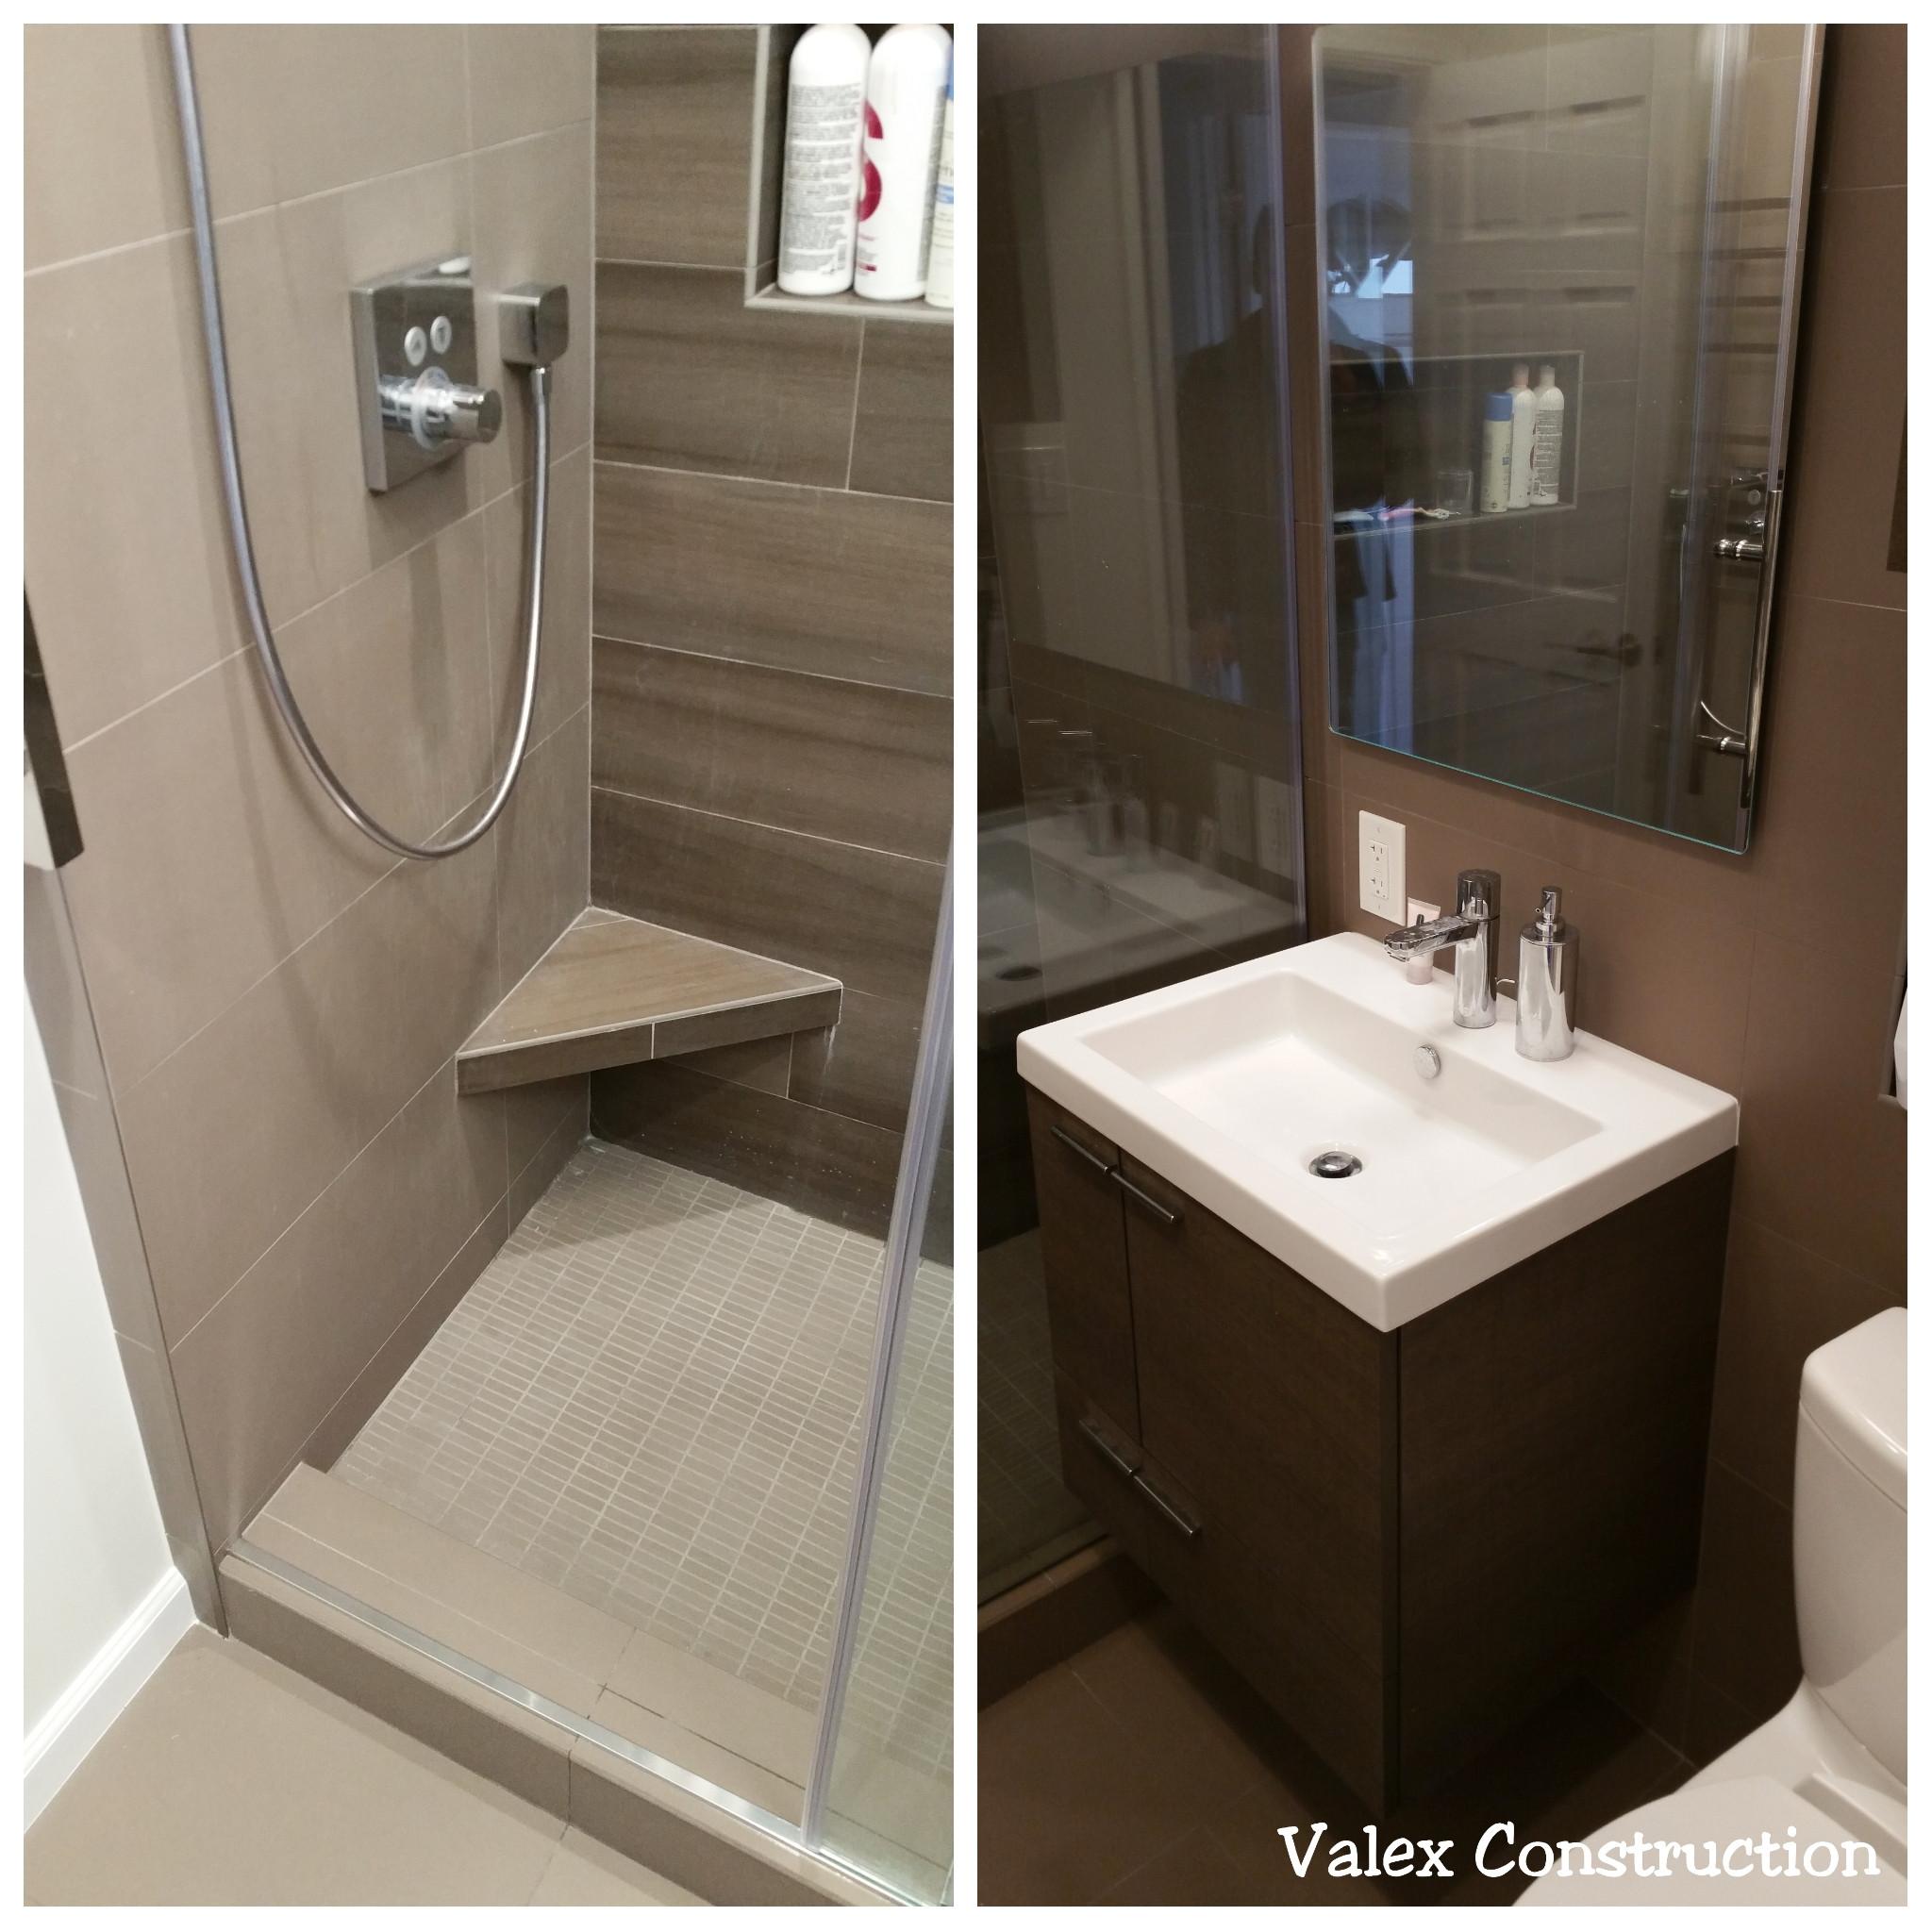 Bathroom Remodeling Estimate